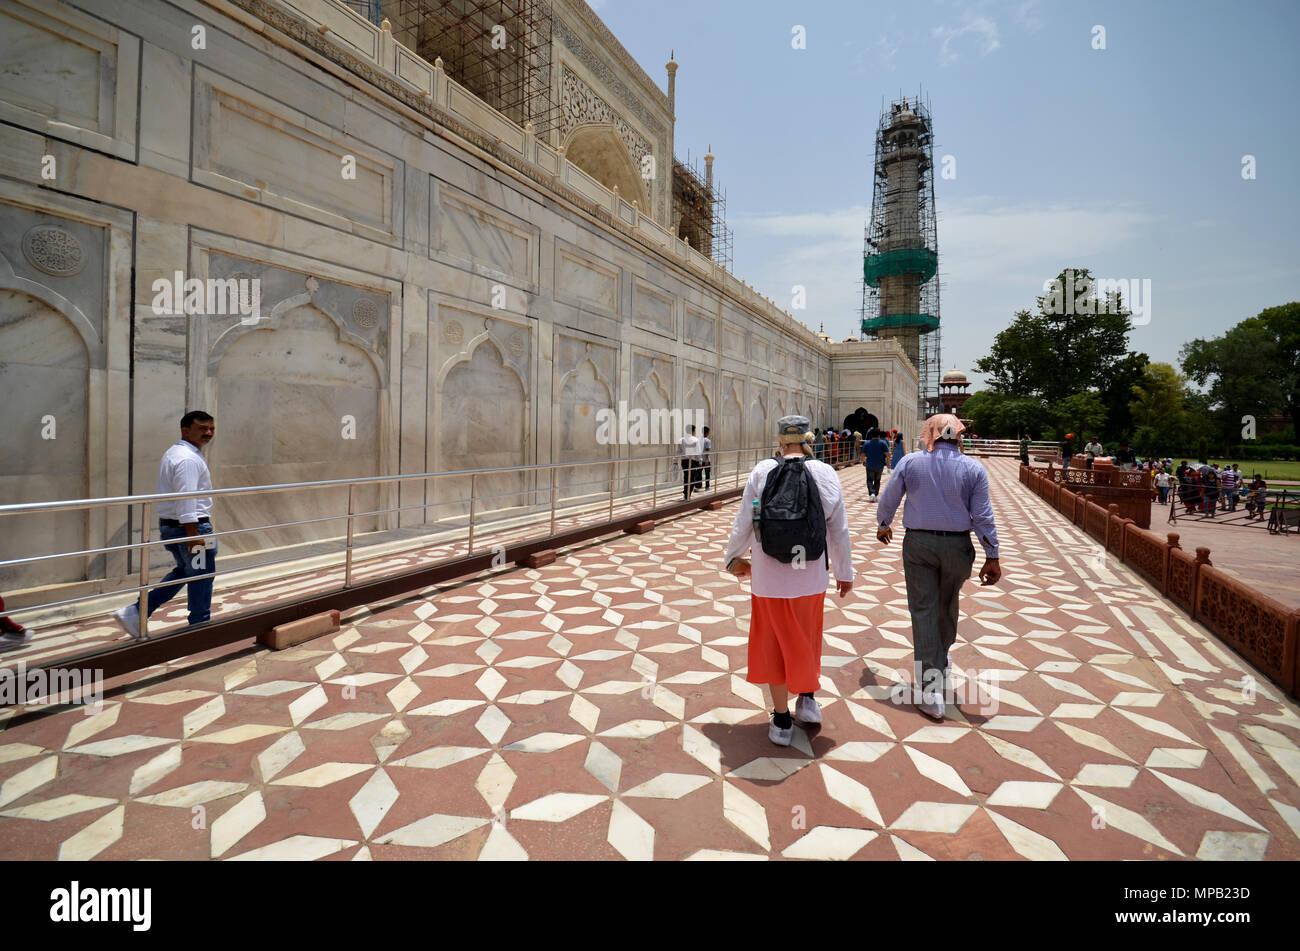 Taj Mahal under repair - Stock Image